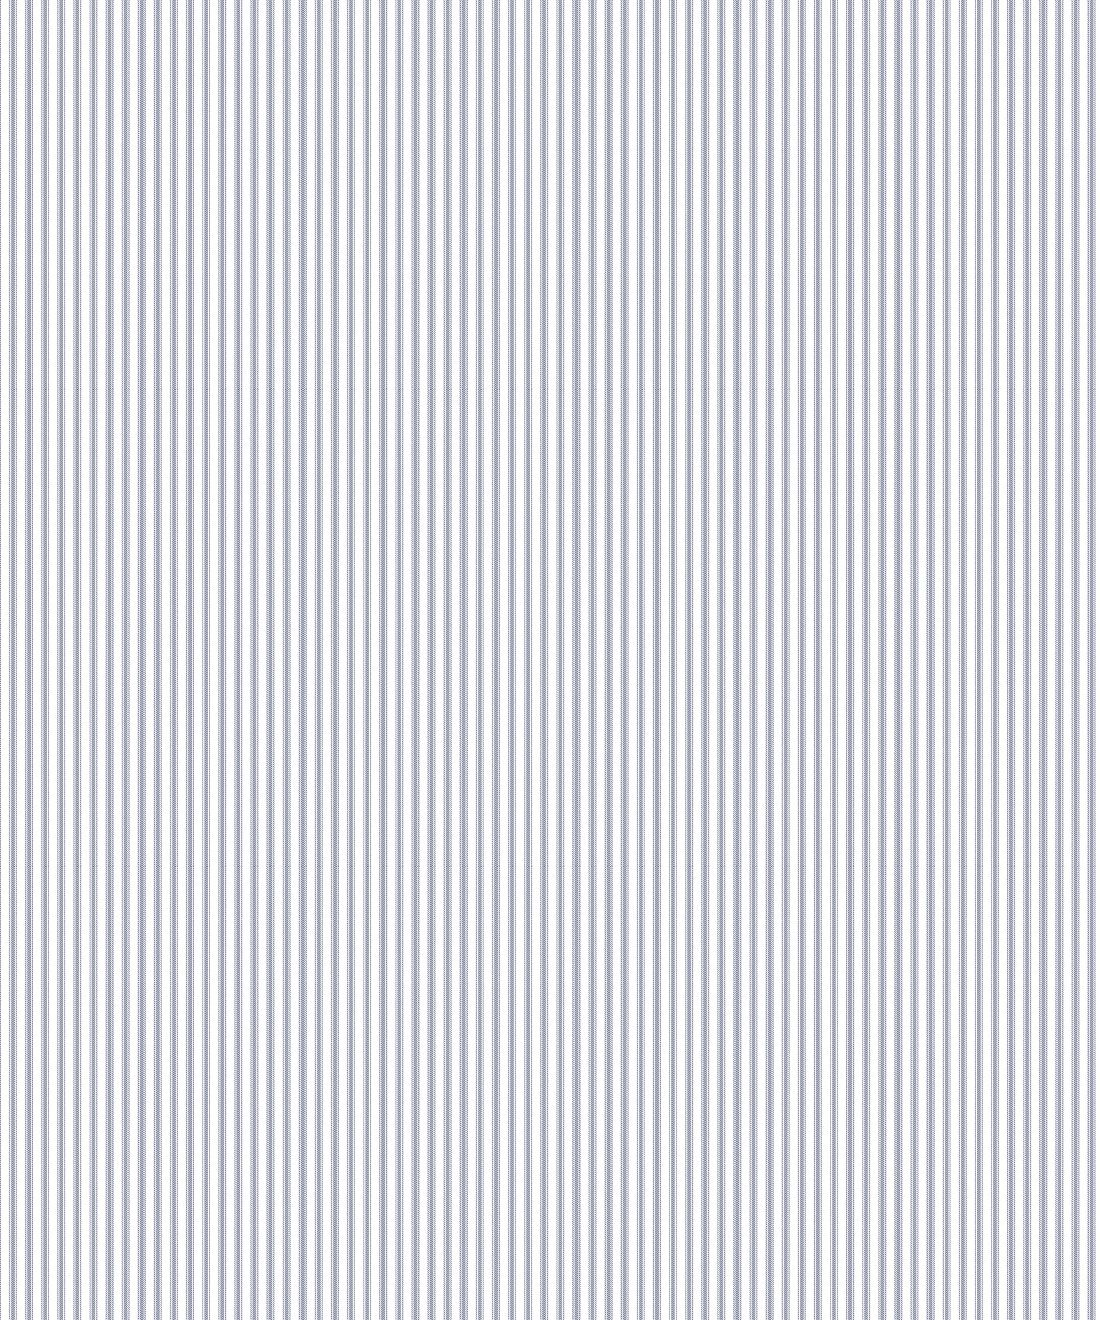 Ticking Stripe Wallpaper • Navy Wallpaper • Swatch